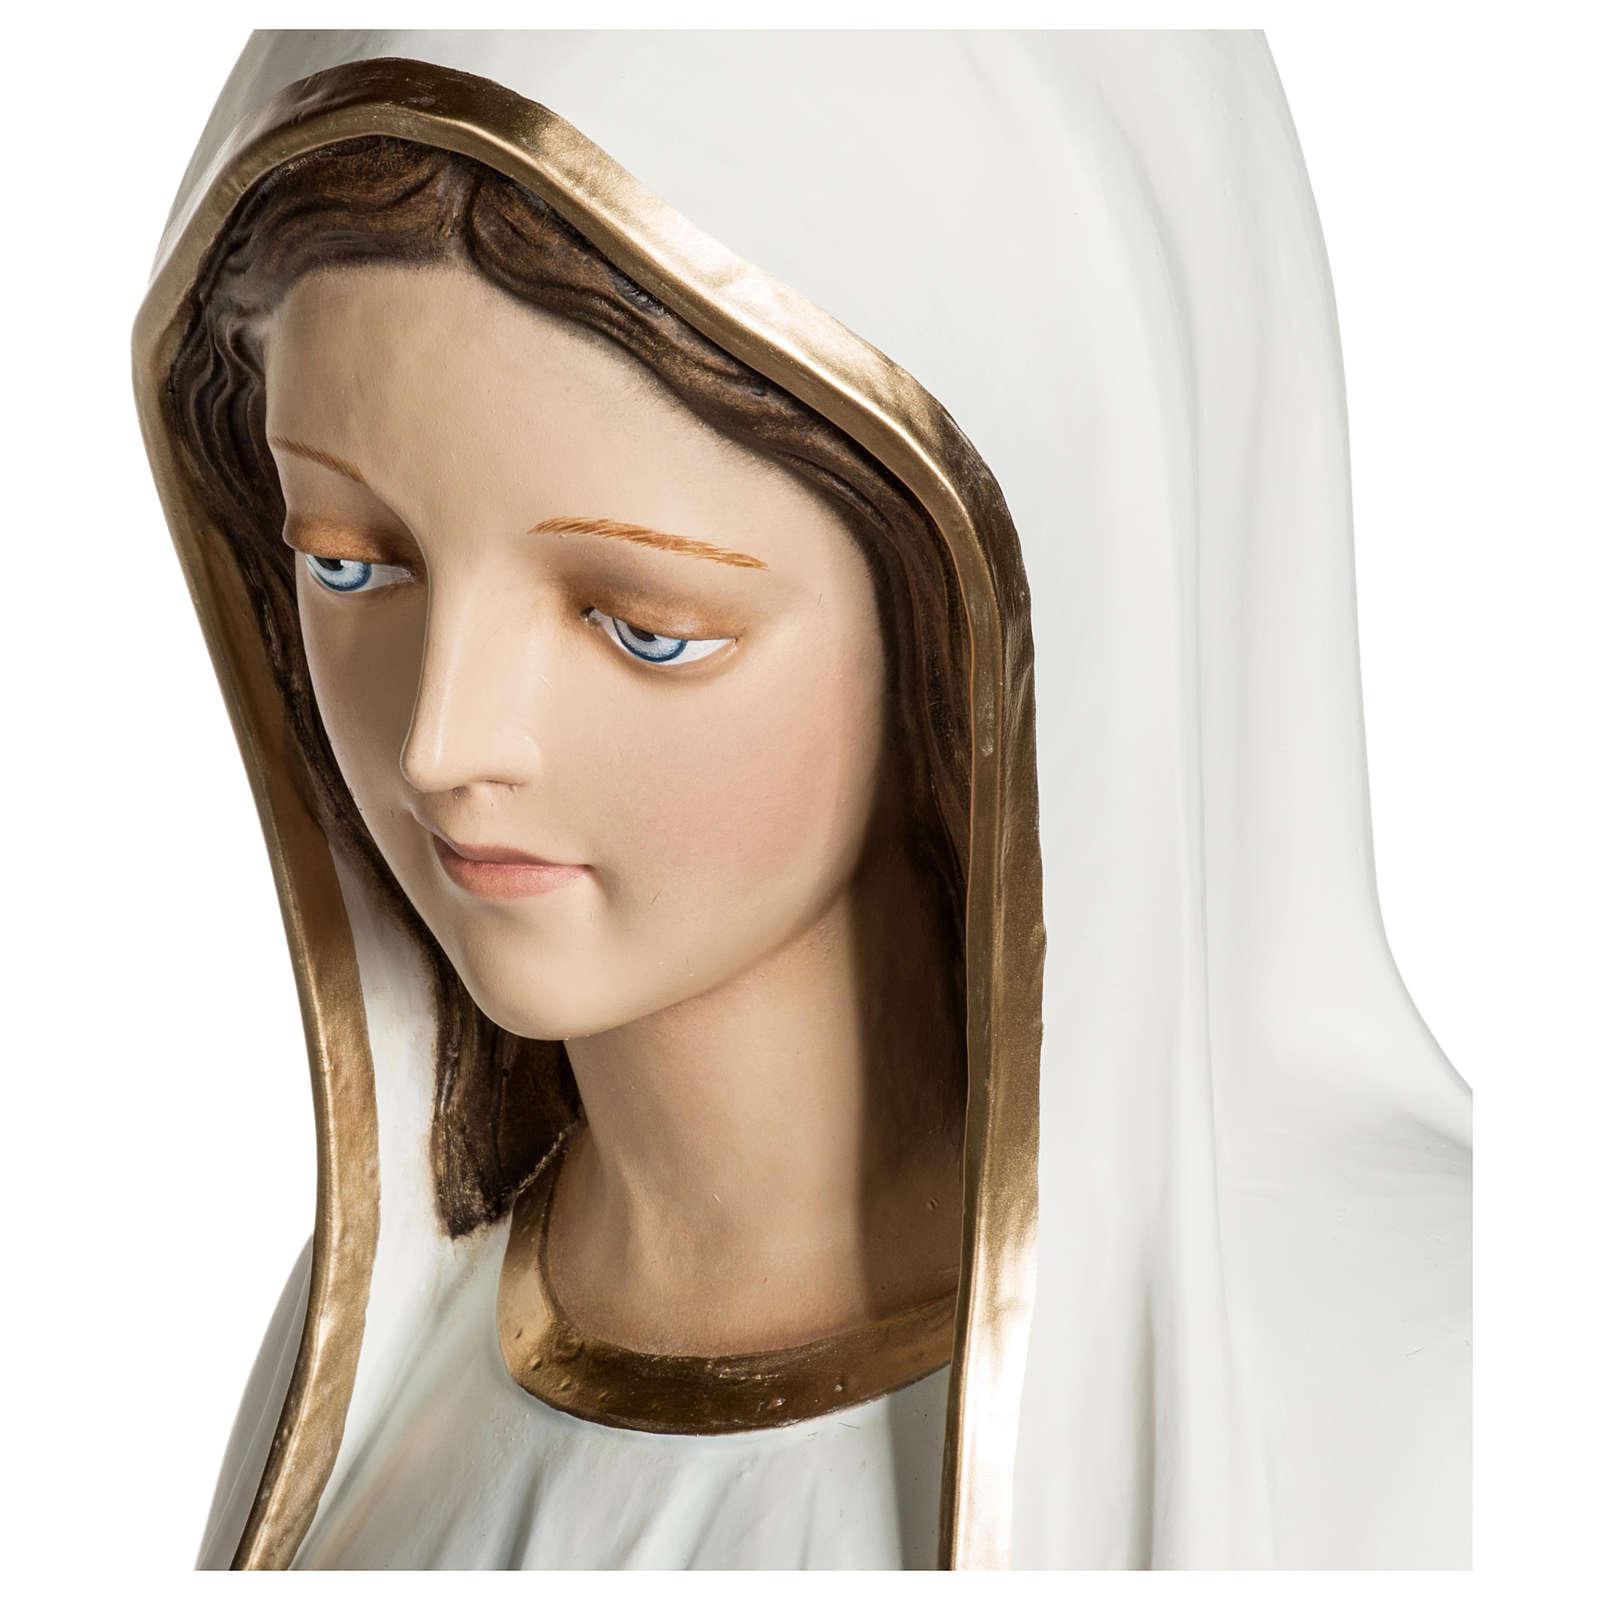 Estatua Virgen de Fátima 120 cm fiberglass PARA EXTERIOR 4